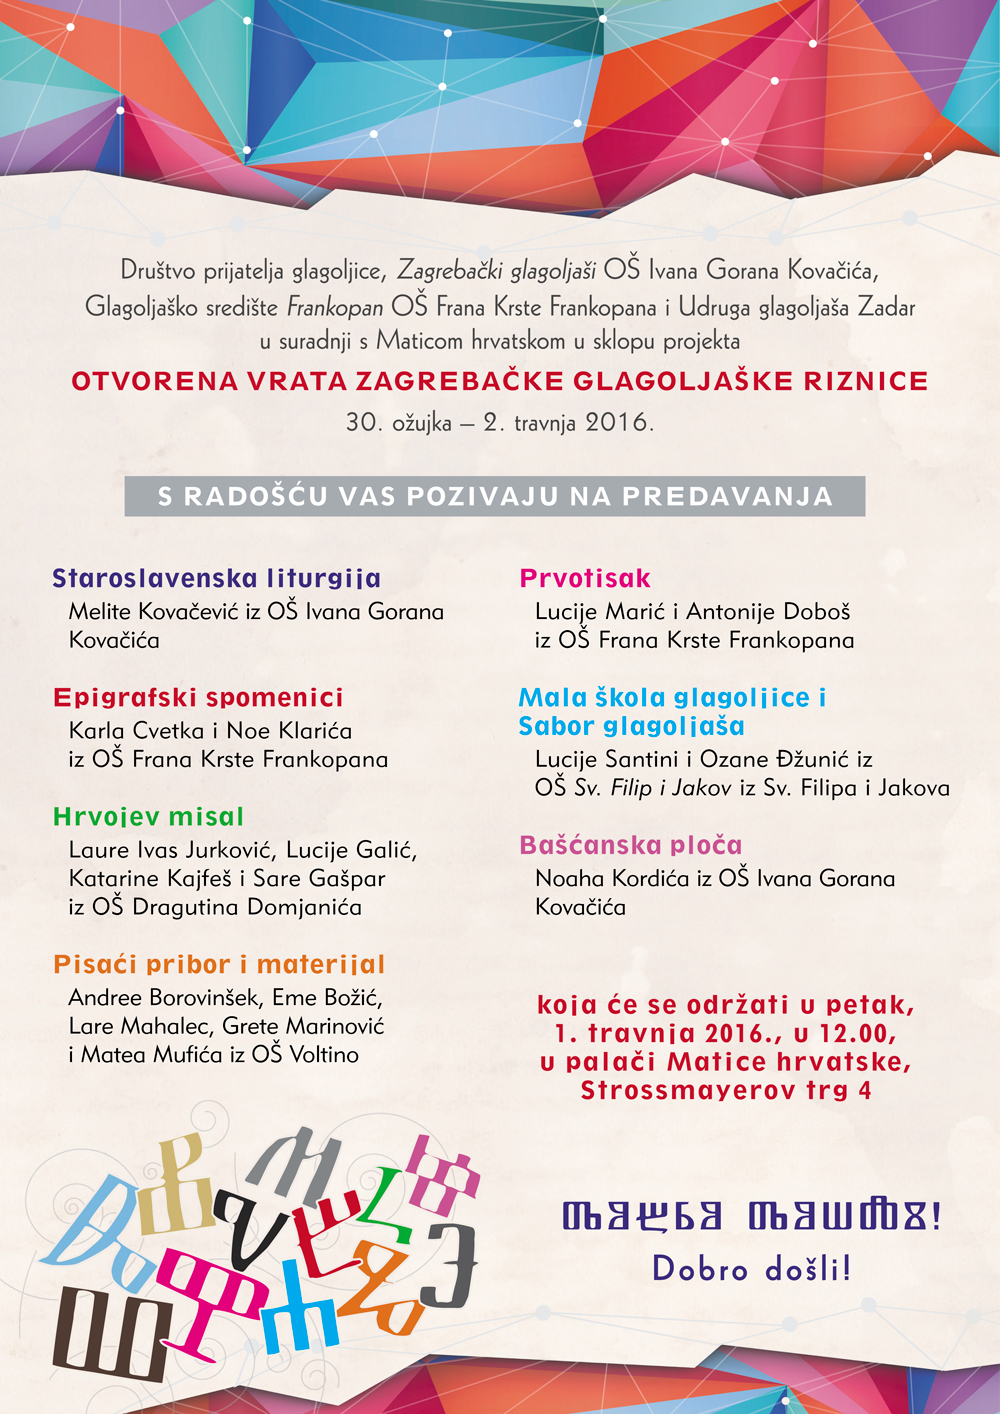 """Otvorena vrata zagrebačke glagoljaške riznice"""